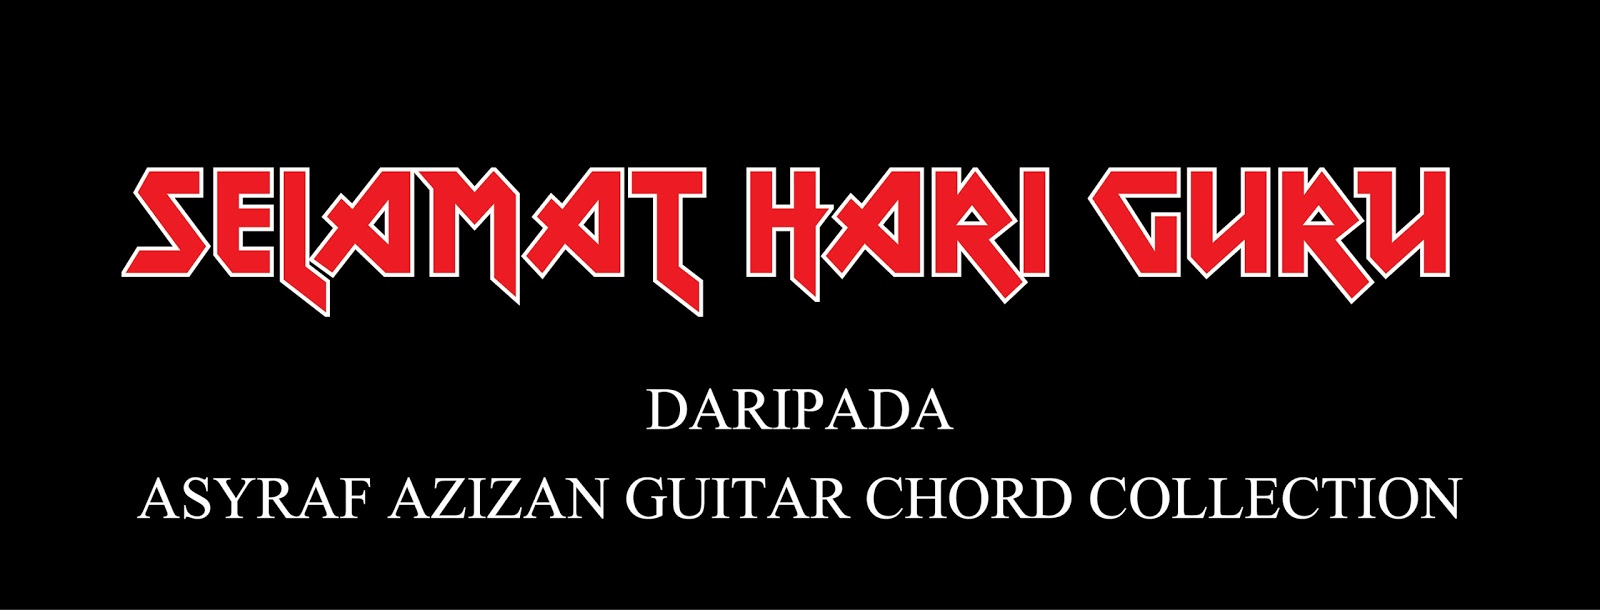 Malaykord  Malay Guitar Chord  Apps on Google Play